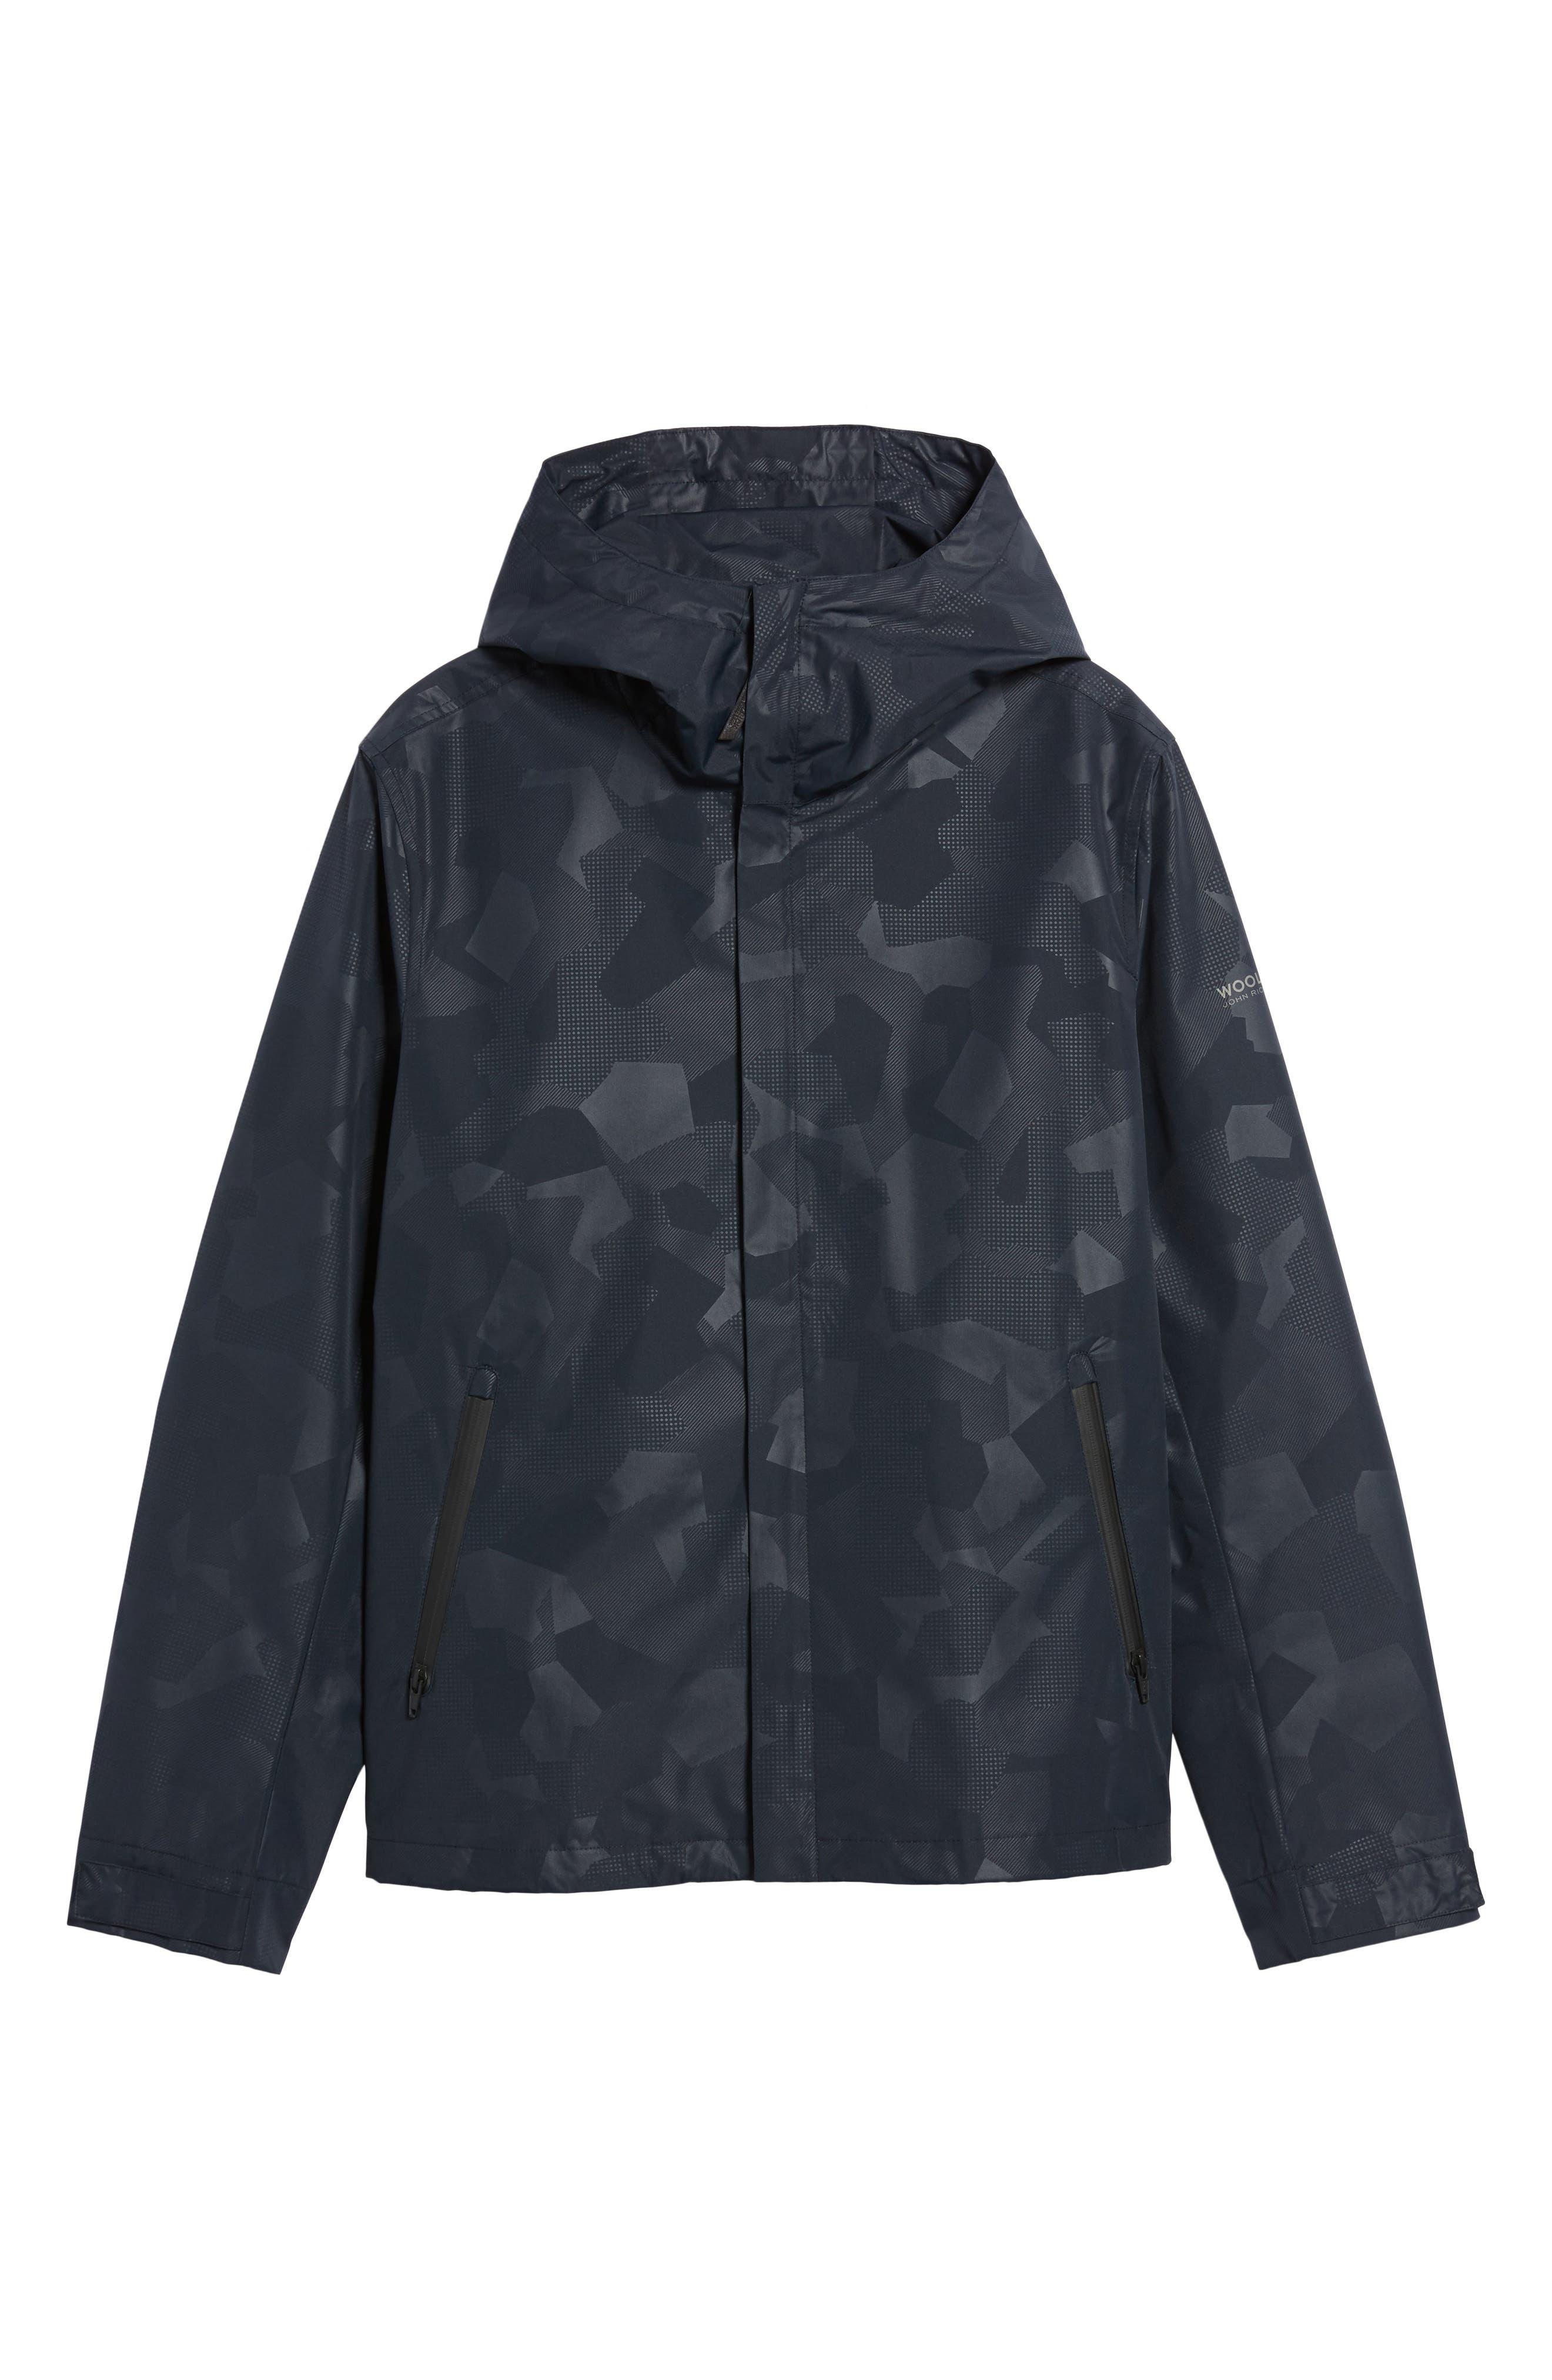 John Rich & Bros. Atlantic Camo Hooded Jacket,                             Alternate thumbnail 6, color,                             Melton Blue Camo